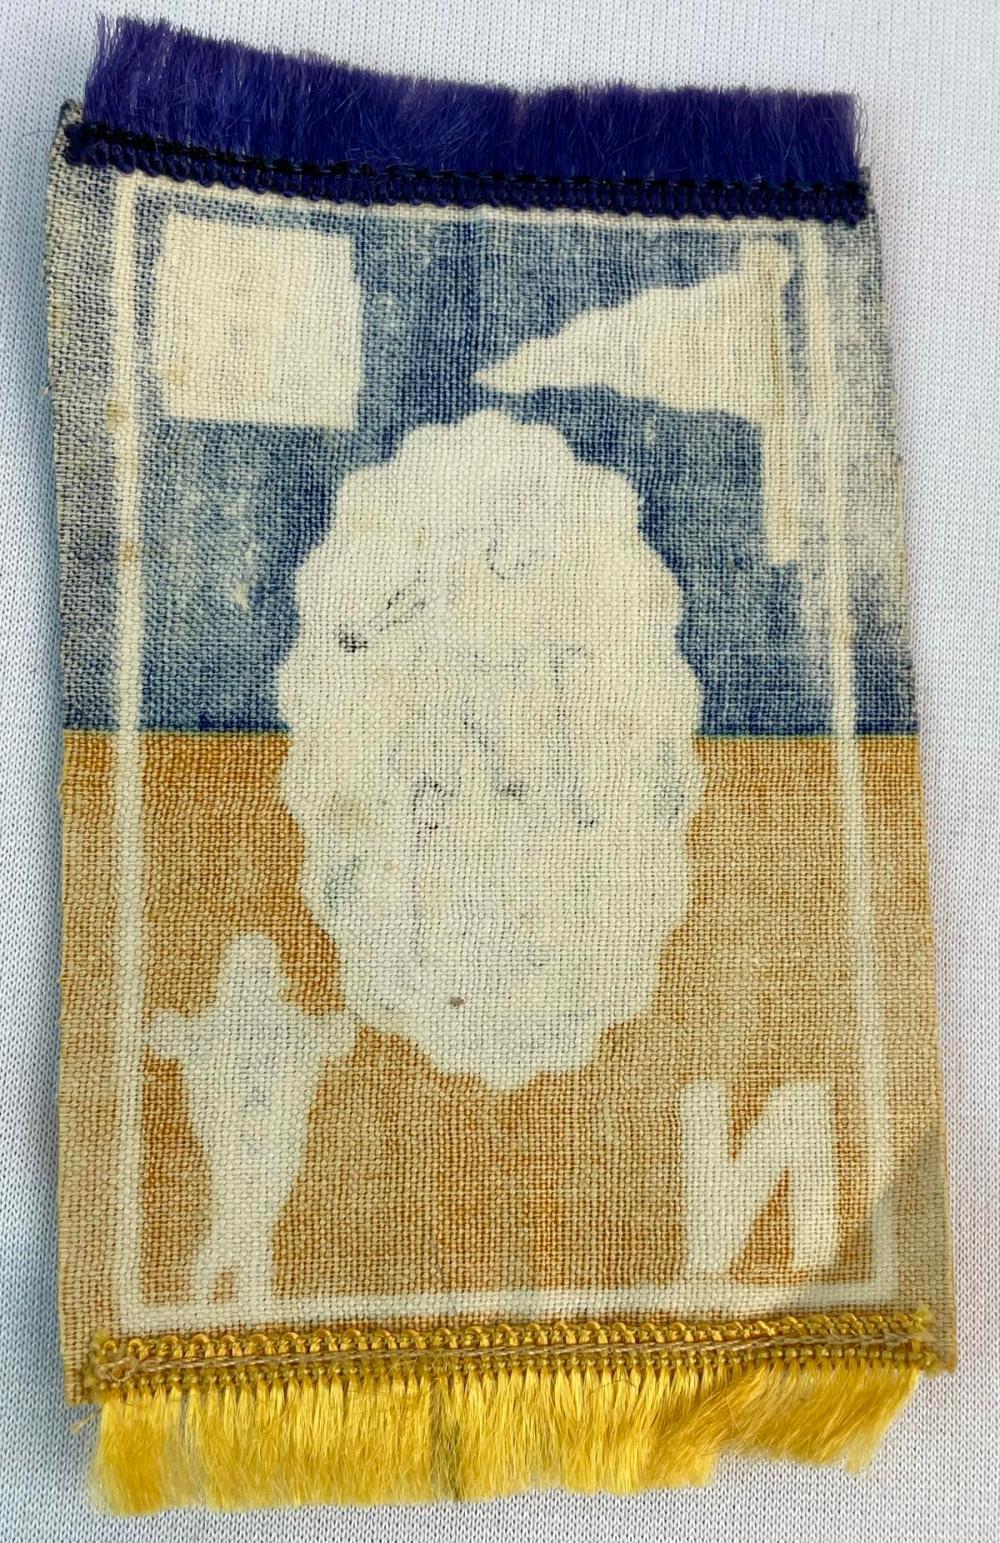 Antique 1910 Navy Midshipmen Track Murad Tobacco Felt Rug B33 Naval Academy